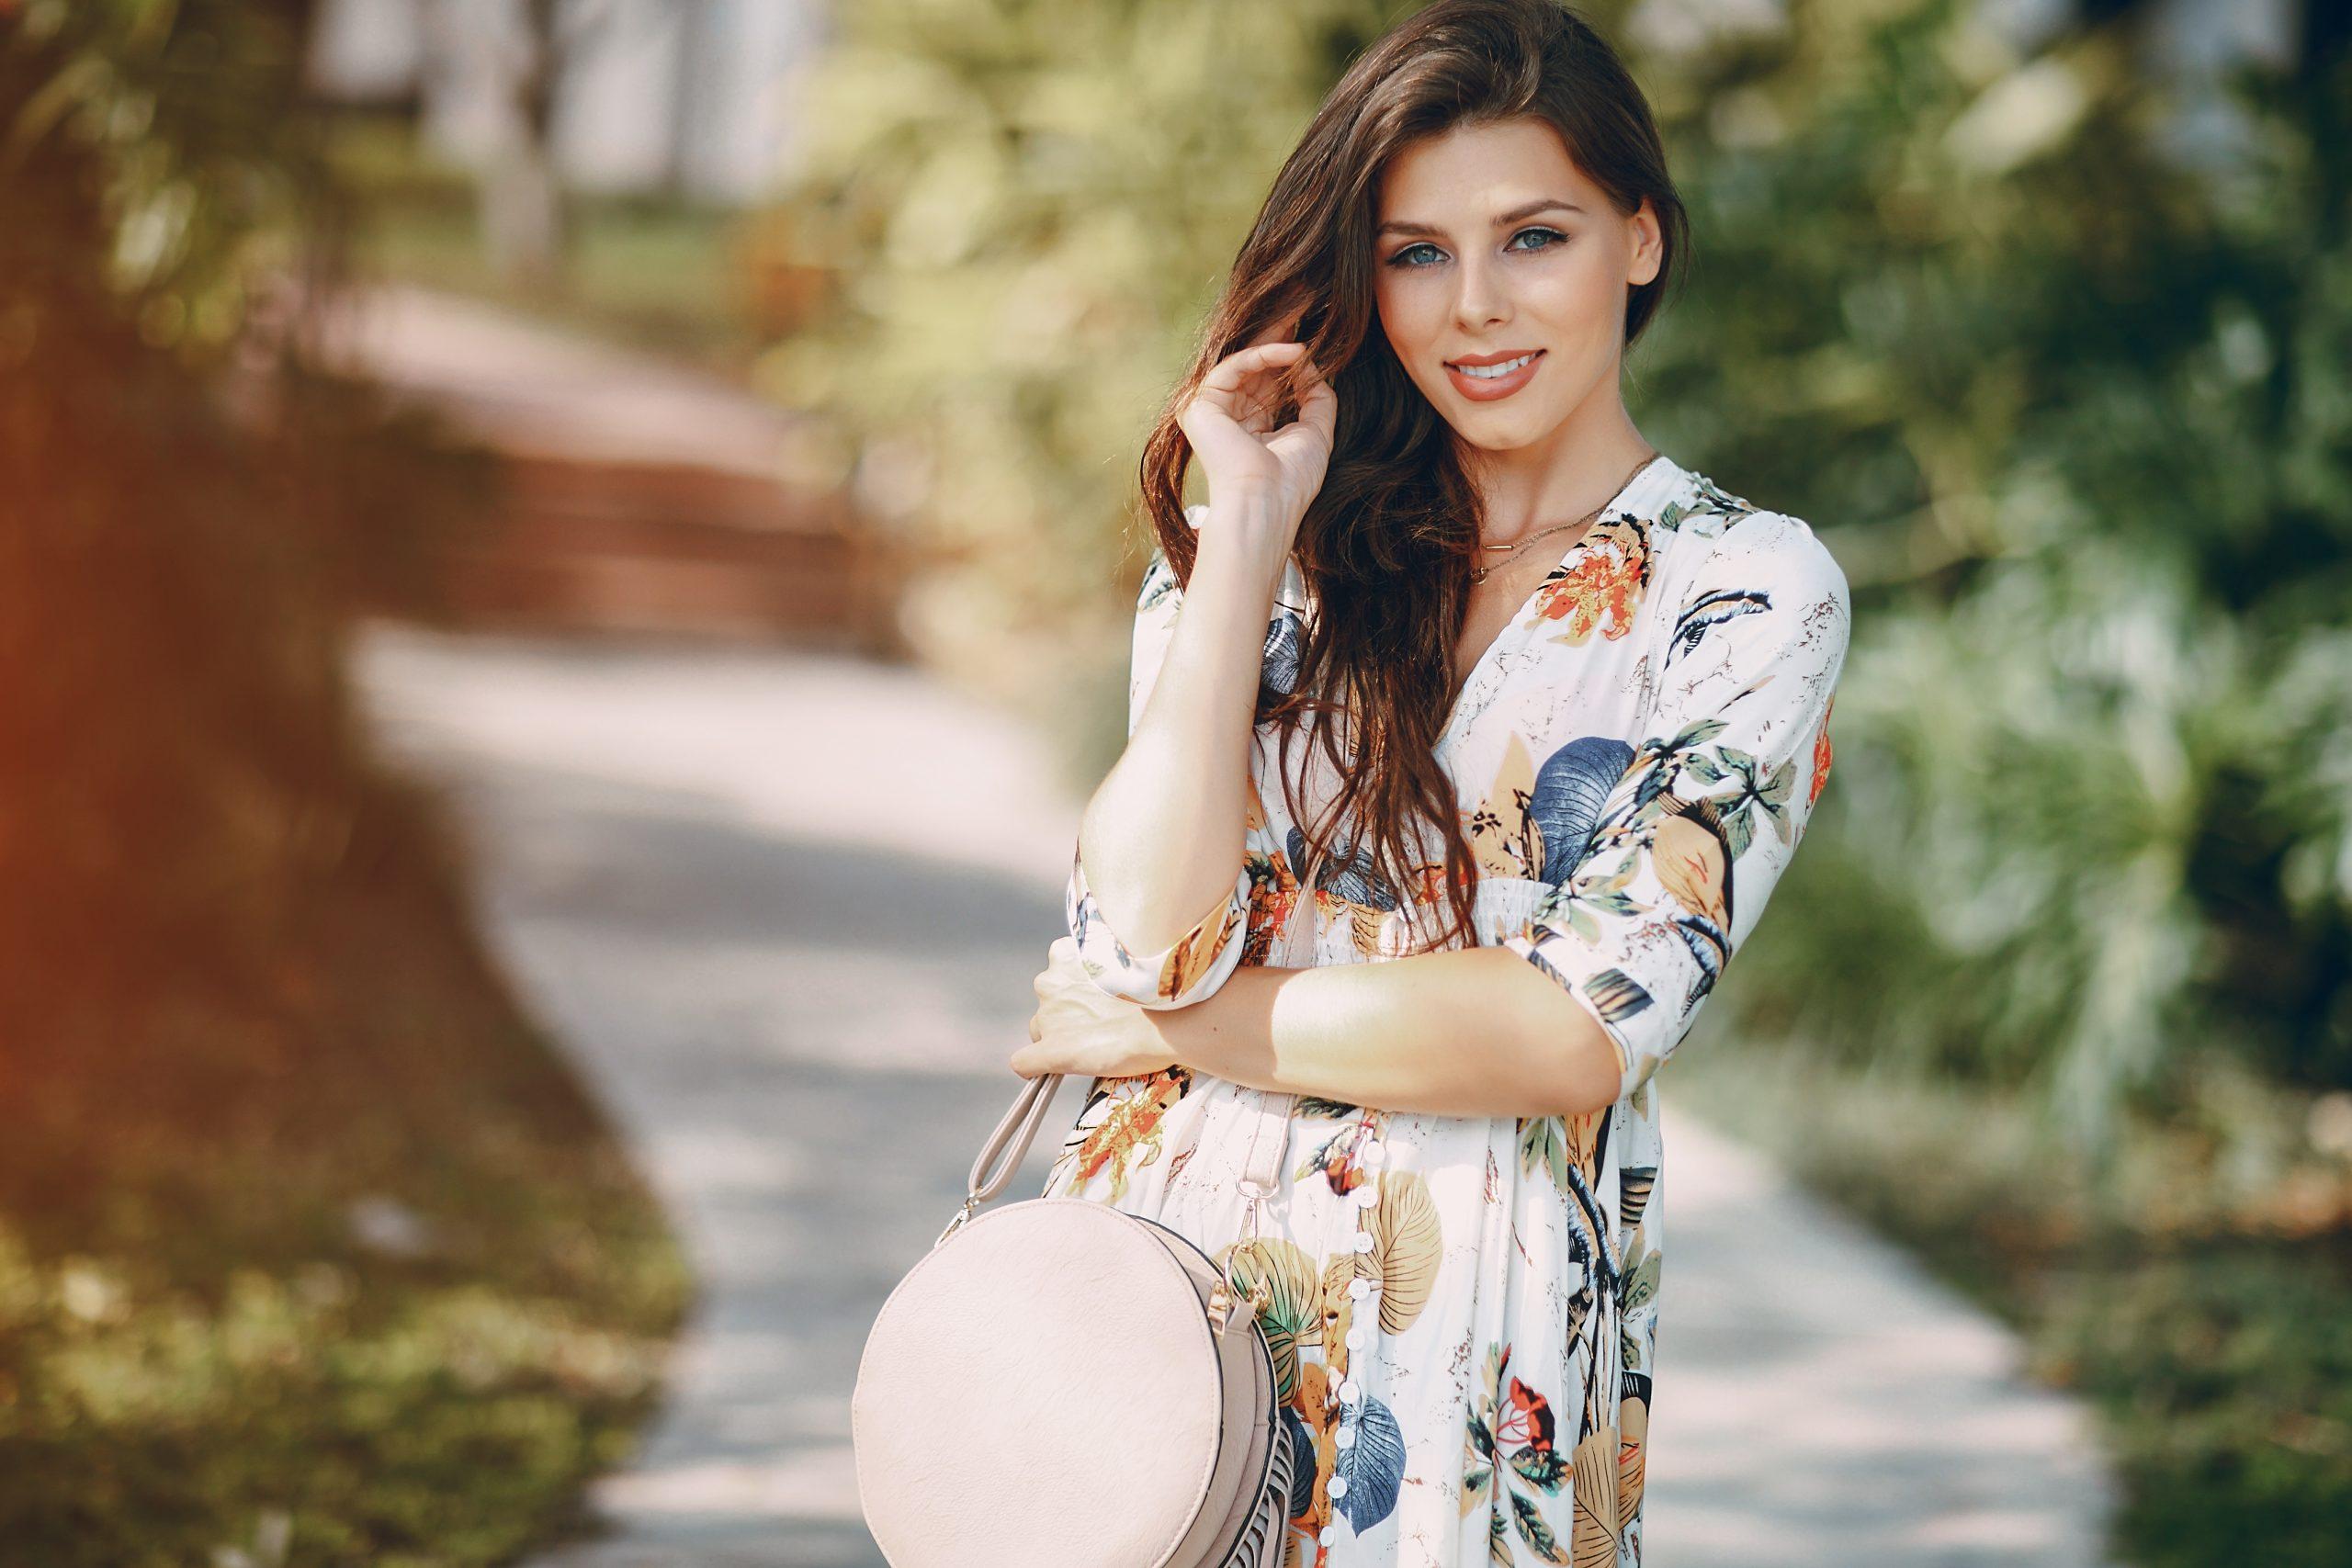 beautiful European girl on the street